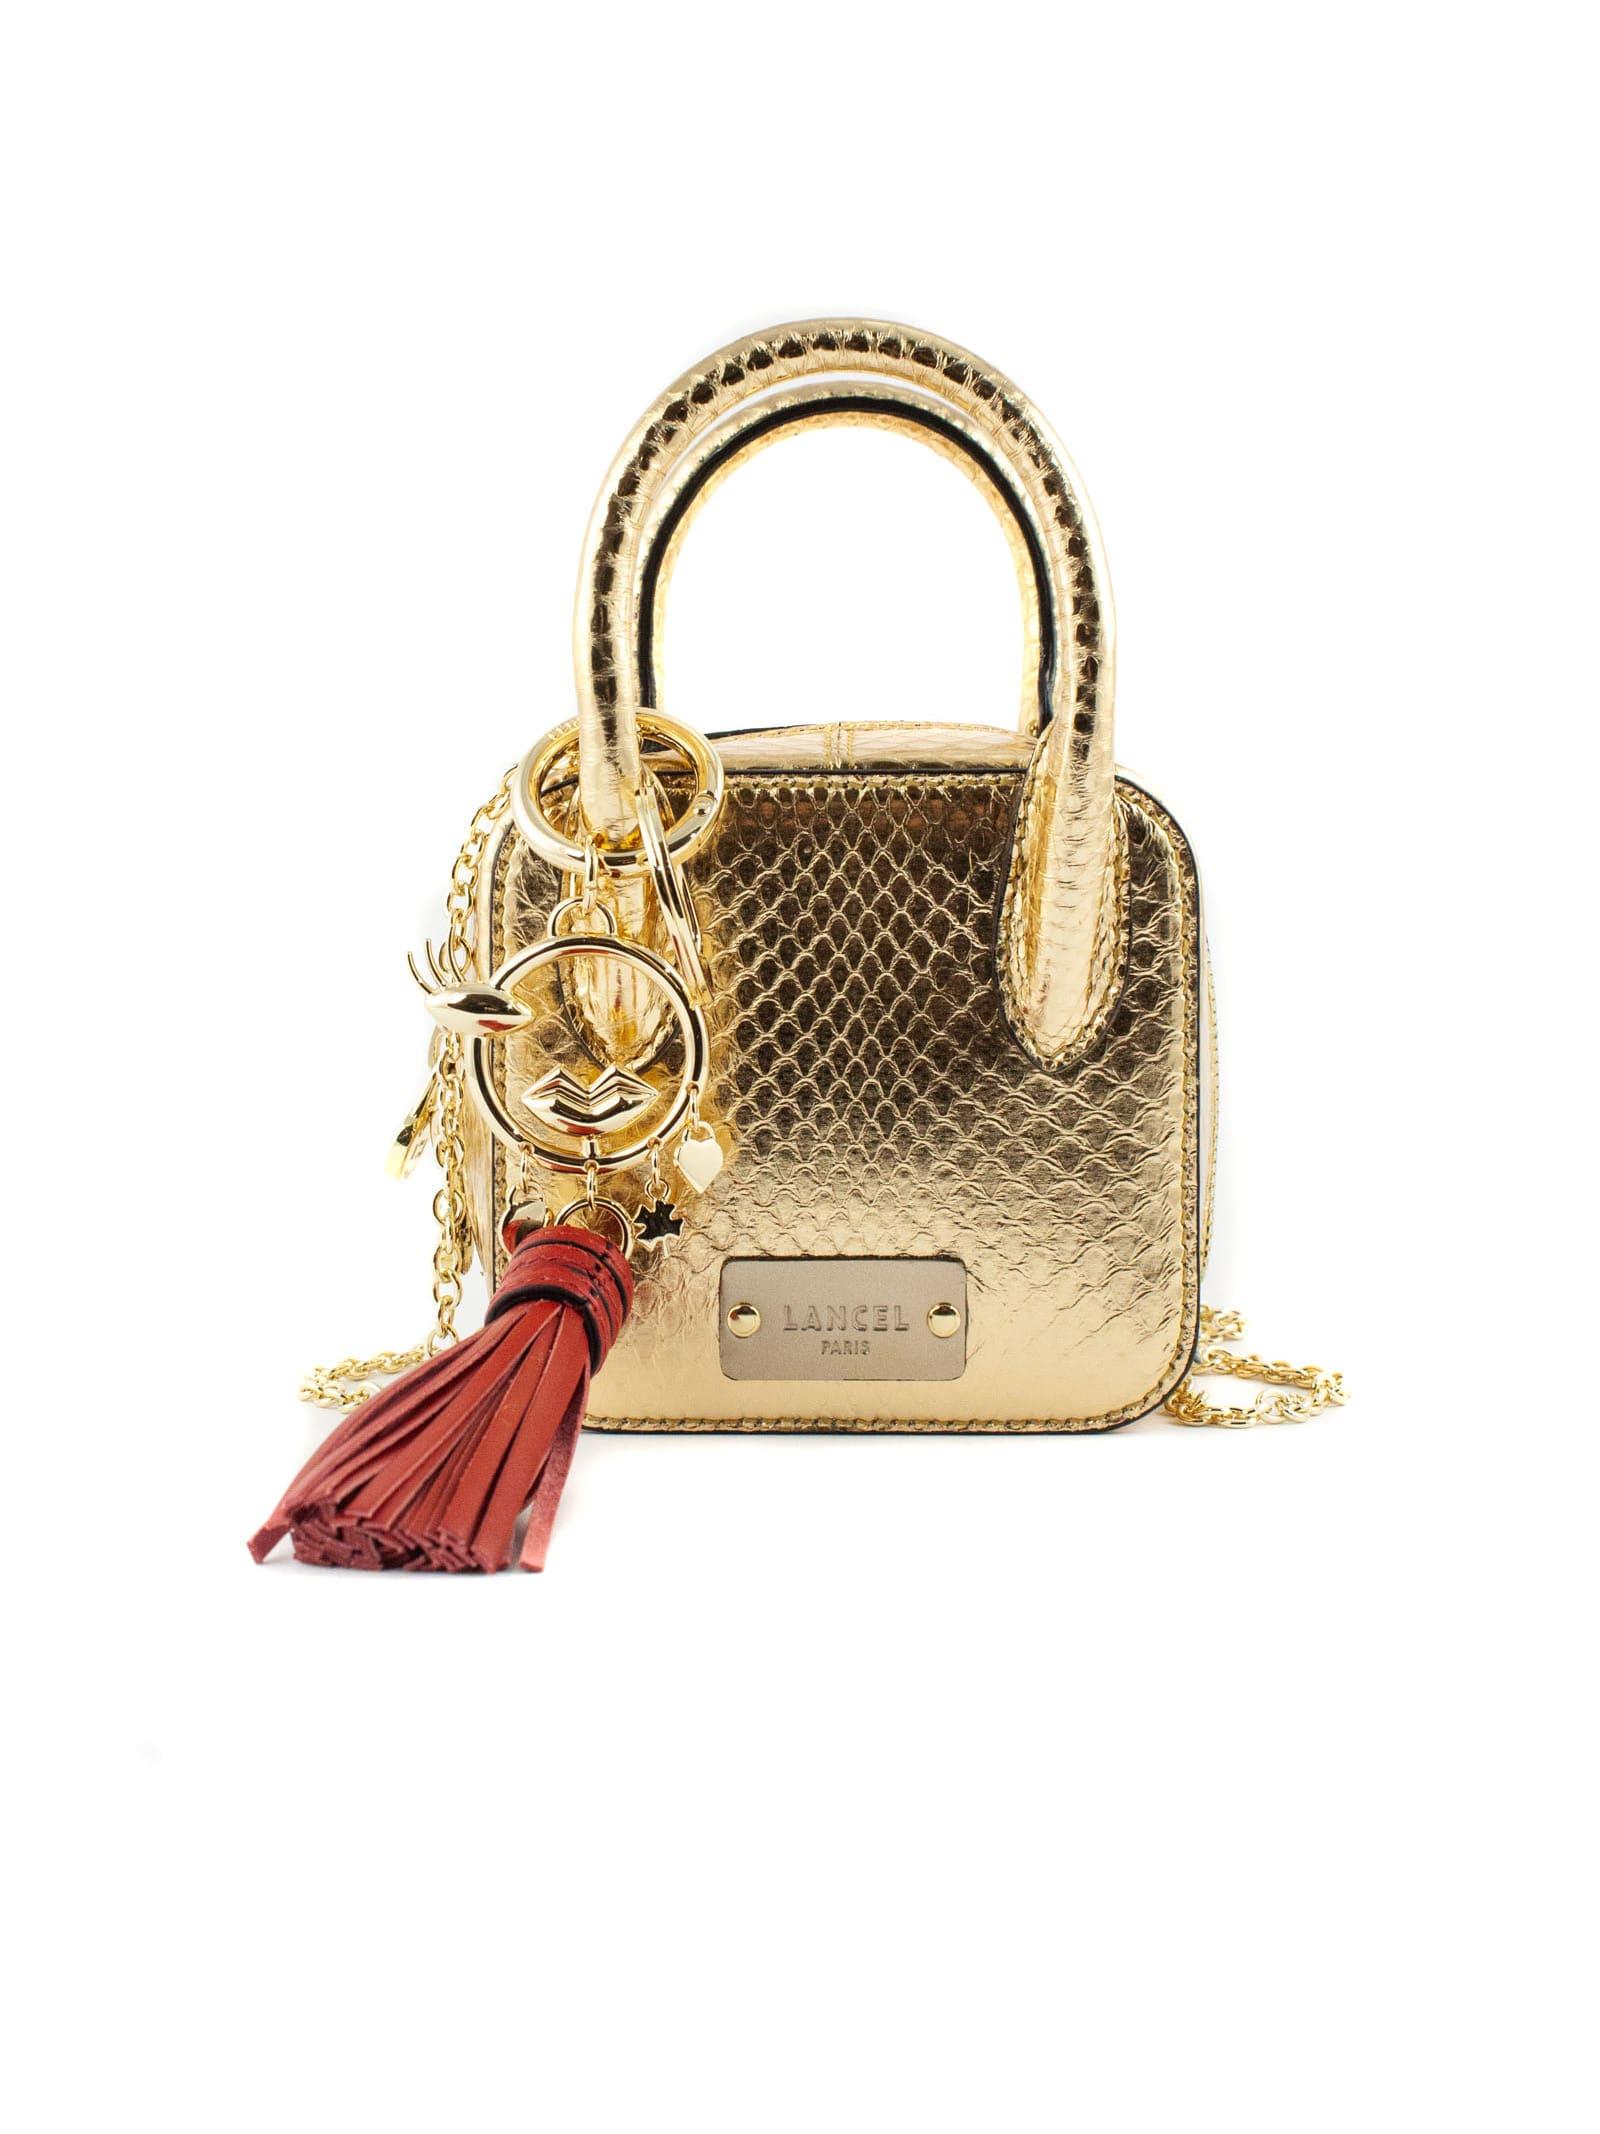 Gold-tone Leather Handbag